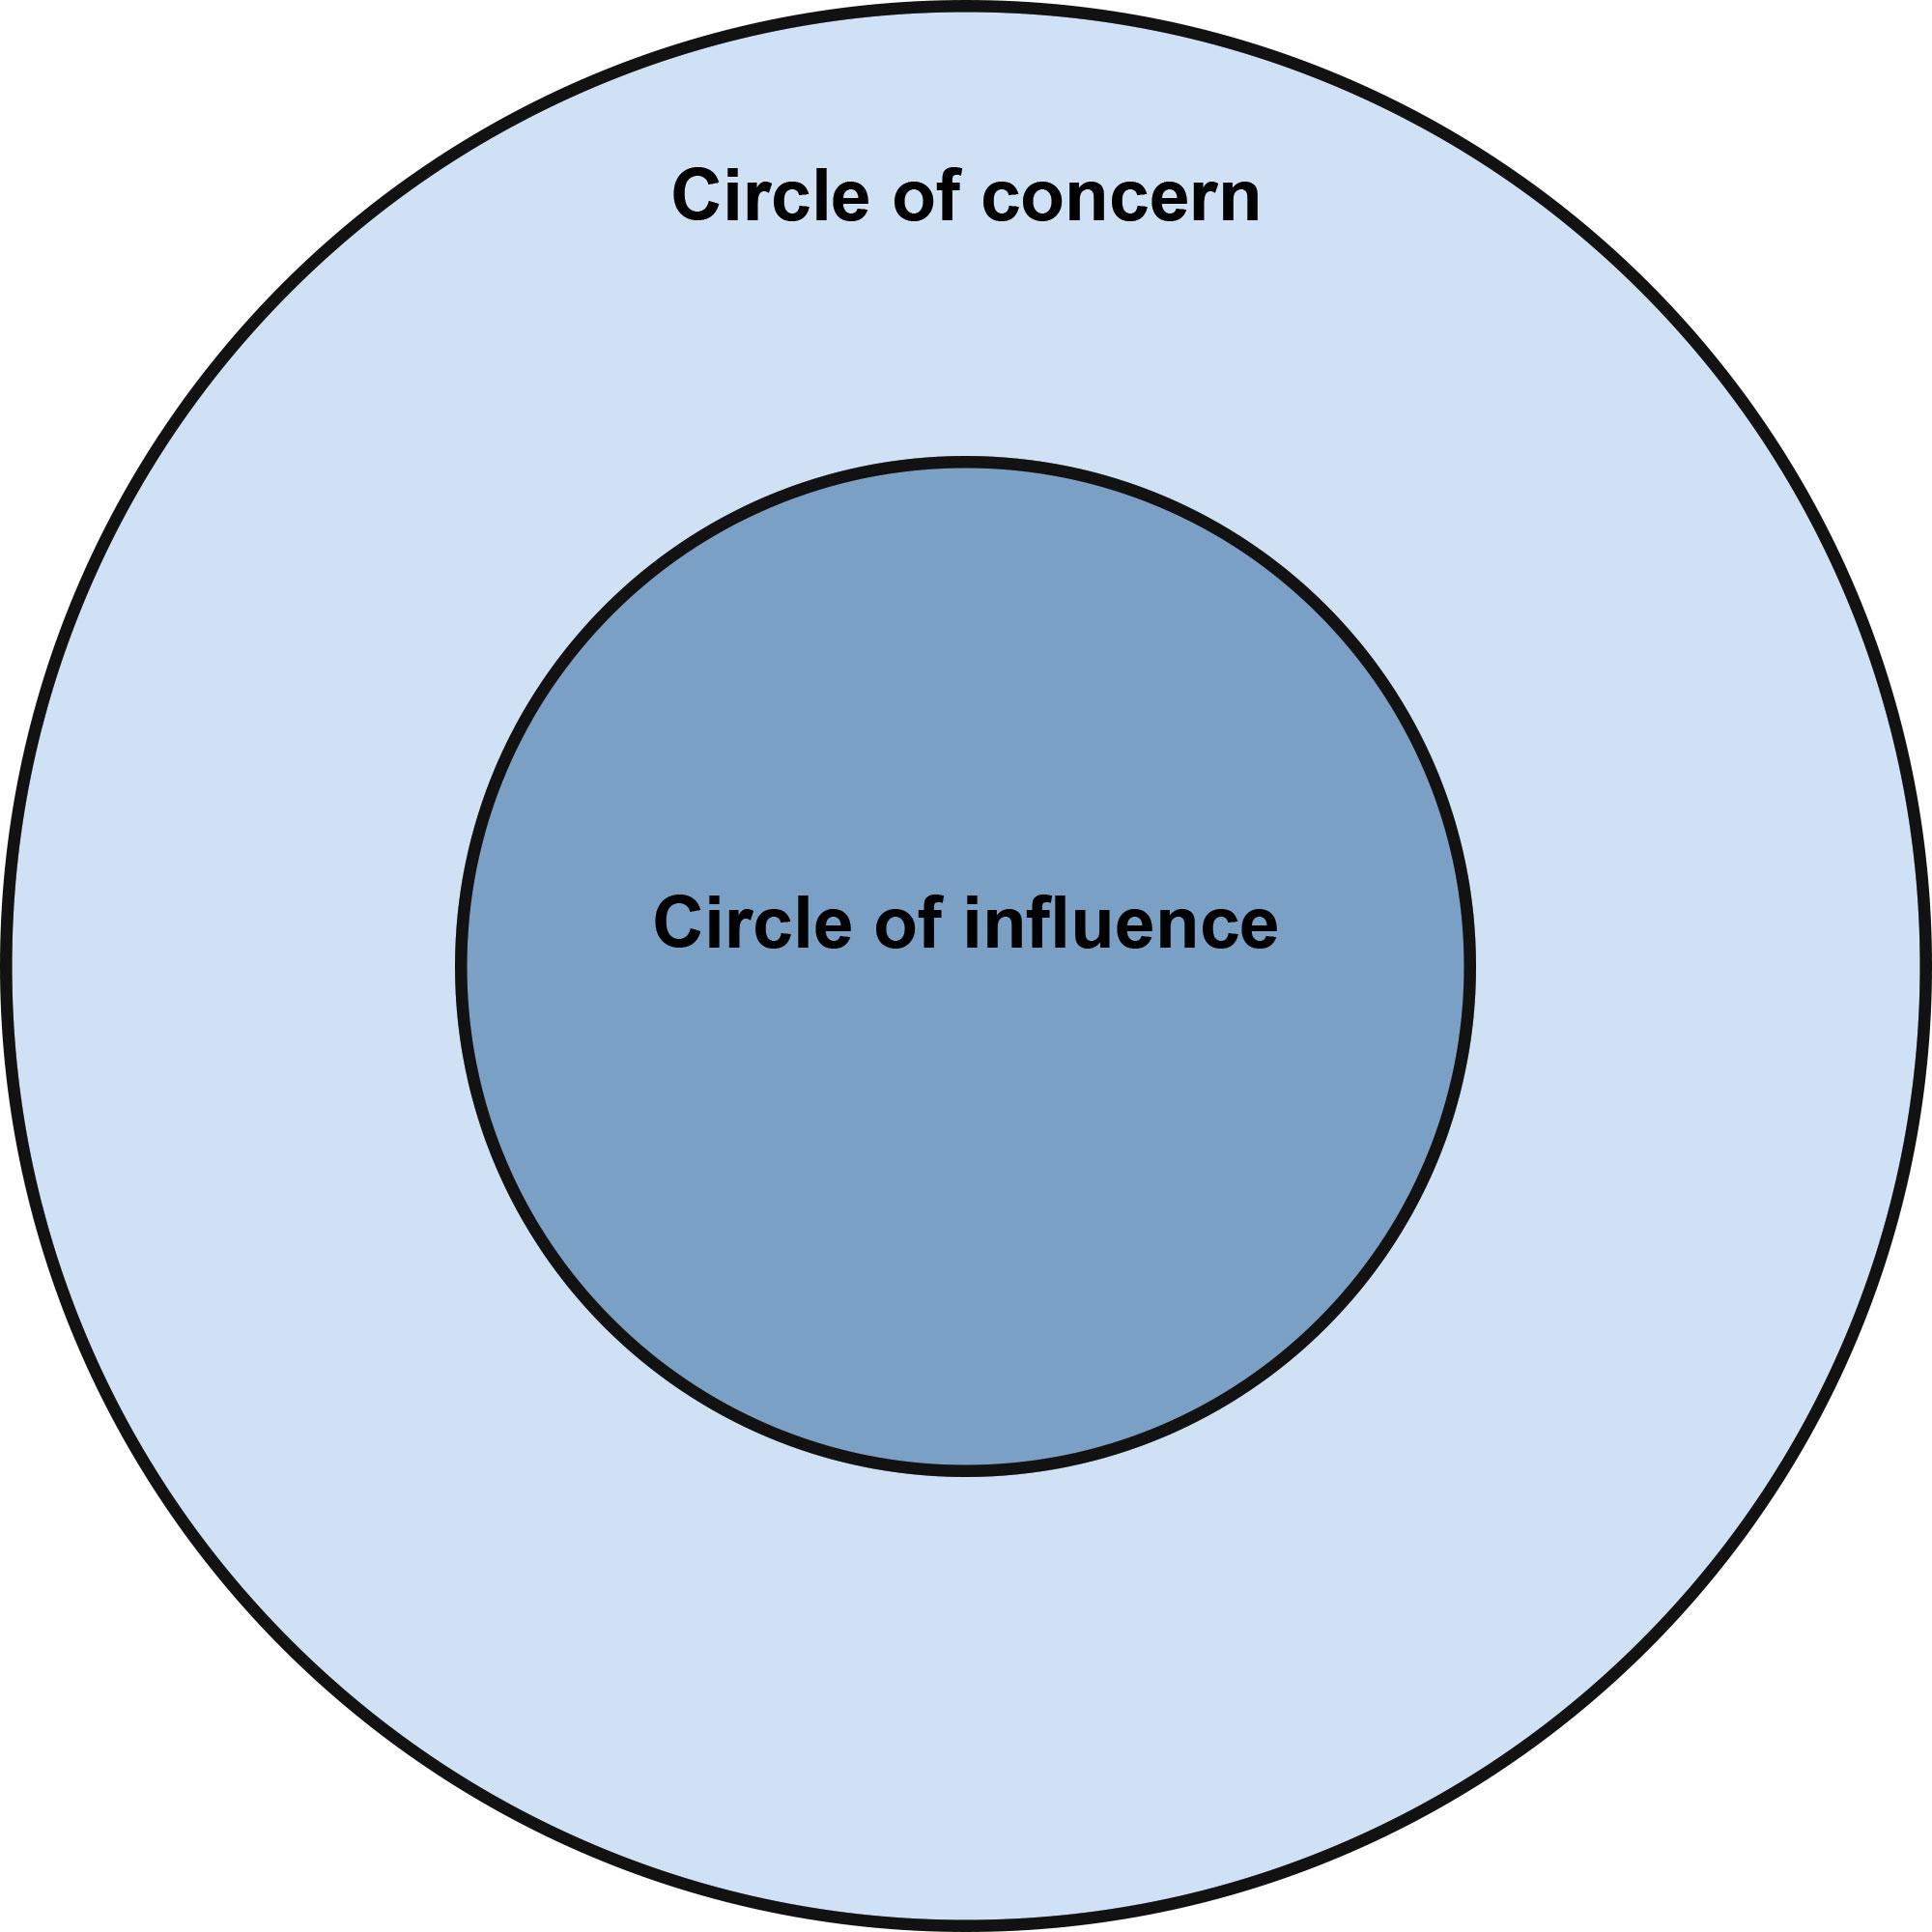 http://www.mdi-training.com/blog/wp-content/uploads/2016/09/Circle-of-influence_2Kreise.jpg